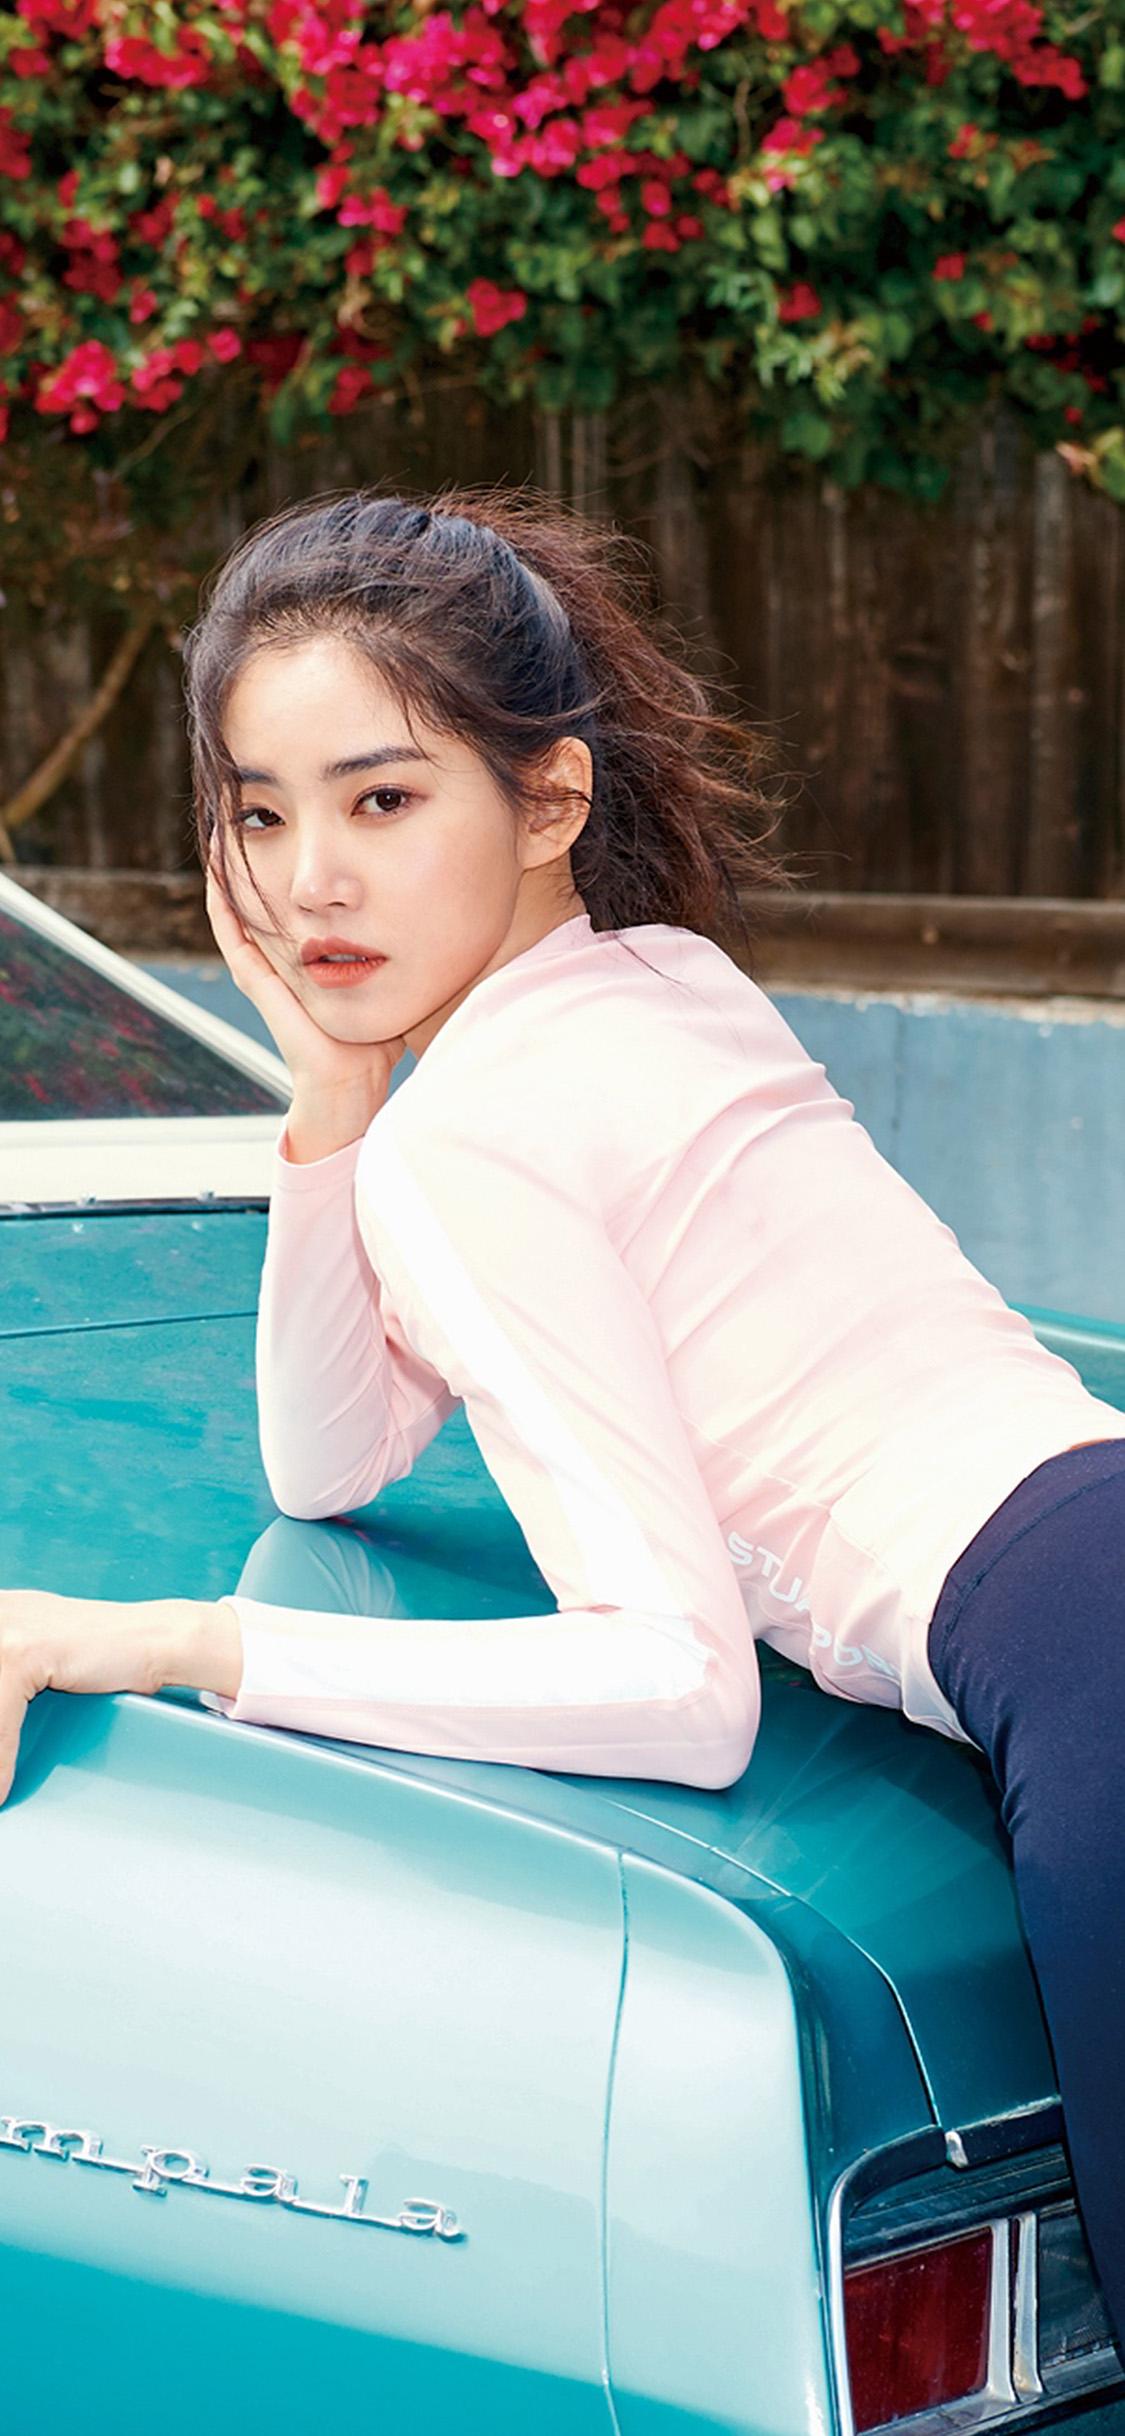 iPhonexpapers.com-Apple-iPhone-wallpaper-hq68-girl-korean-film-actress